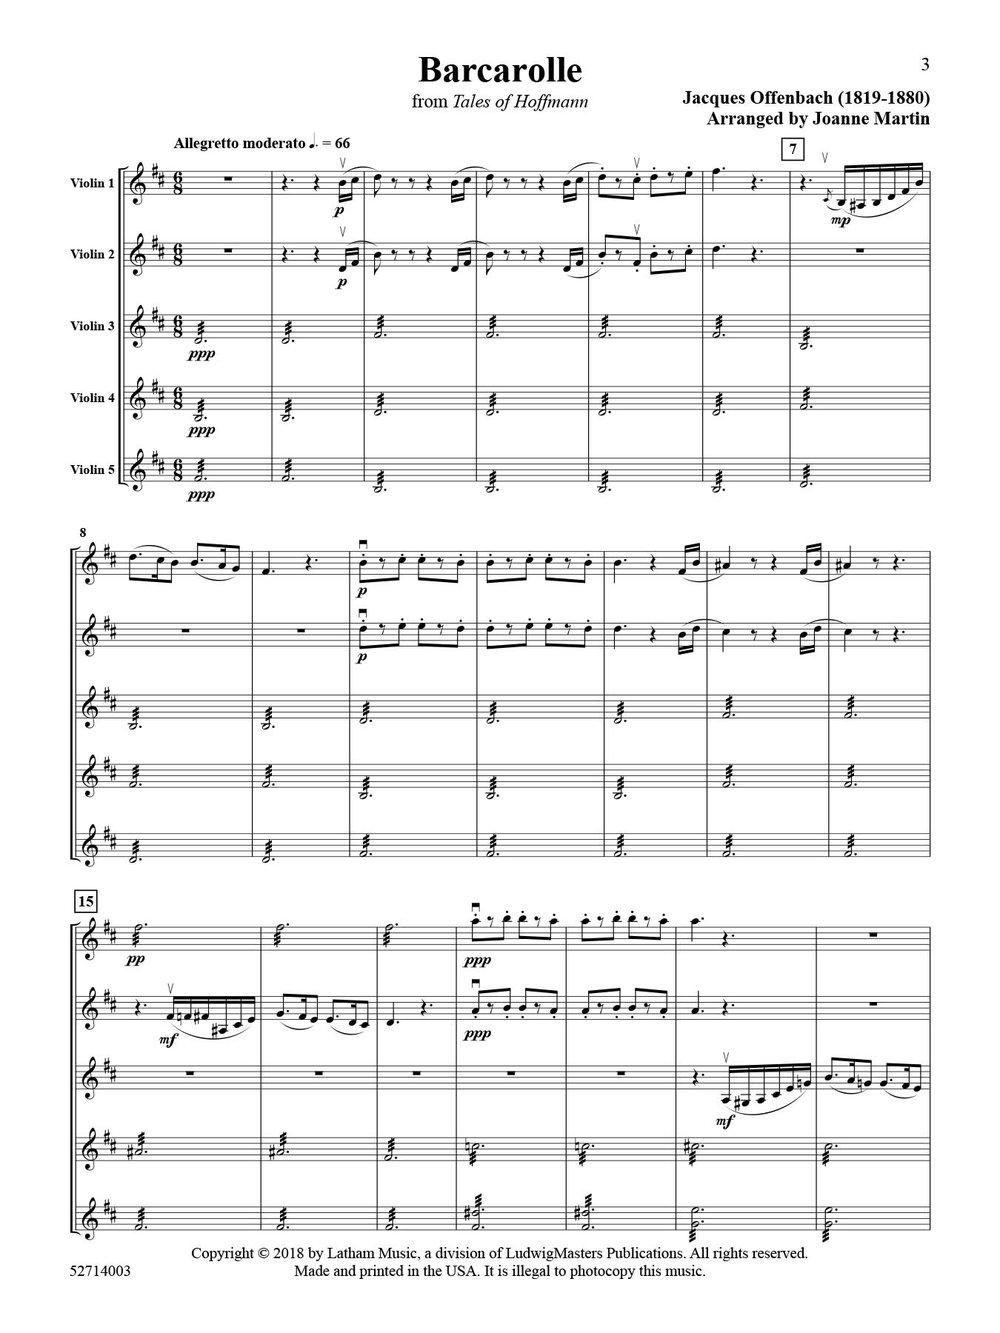 barcarolle-violin-quintet-score-sample.jpg